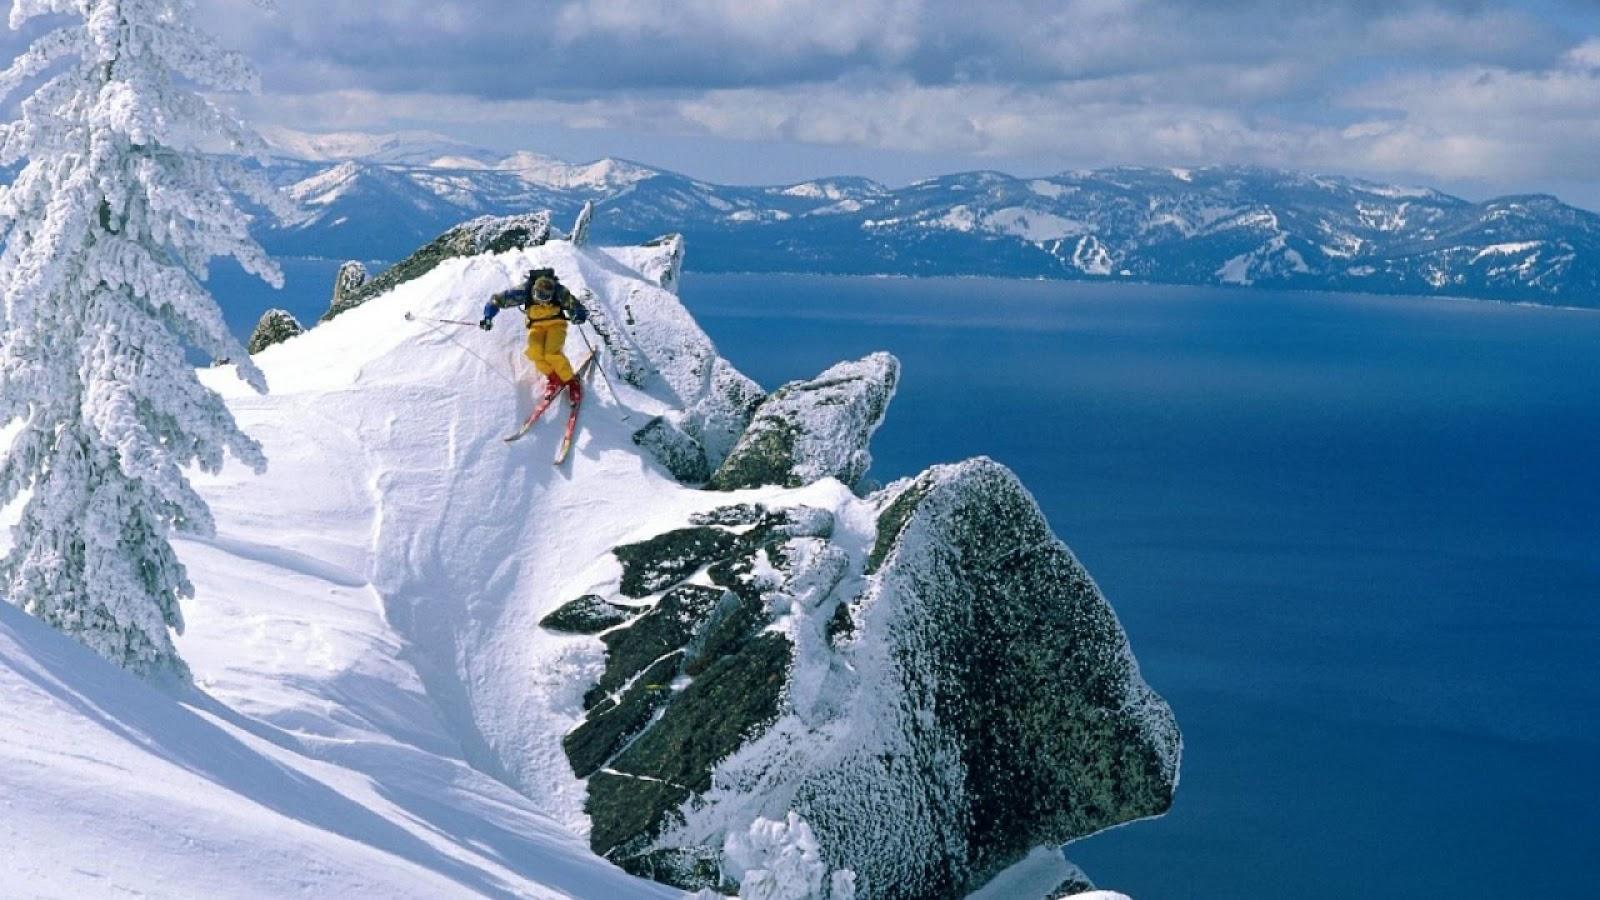 http://2.bp.blogspot.com/-n2bcobQjNFk/UKoiO0uf91I/AAAAAAAAHMM/z4RaL_6-KV8/s1600/Ski_Wallpaper_7.jpg